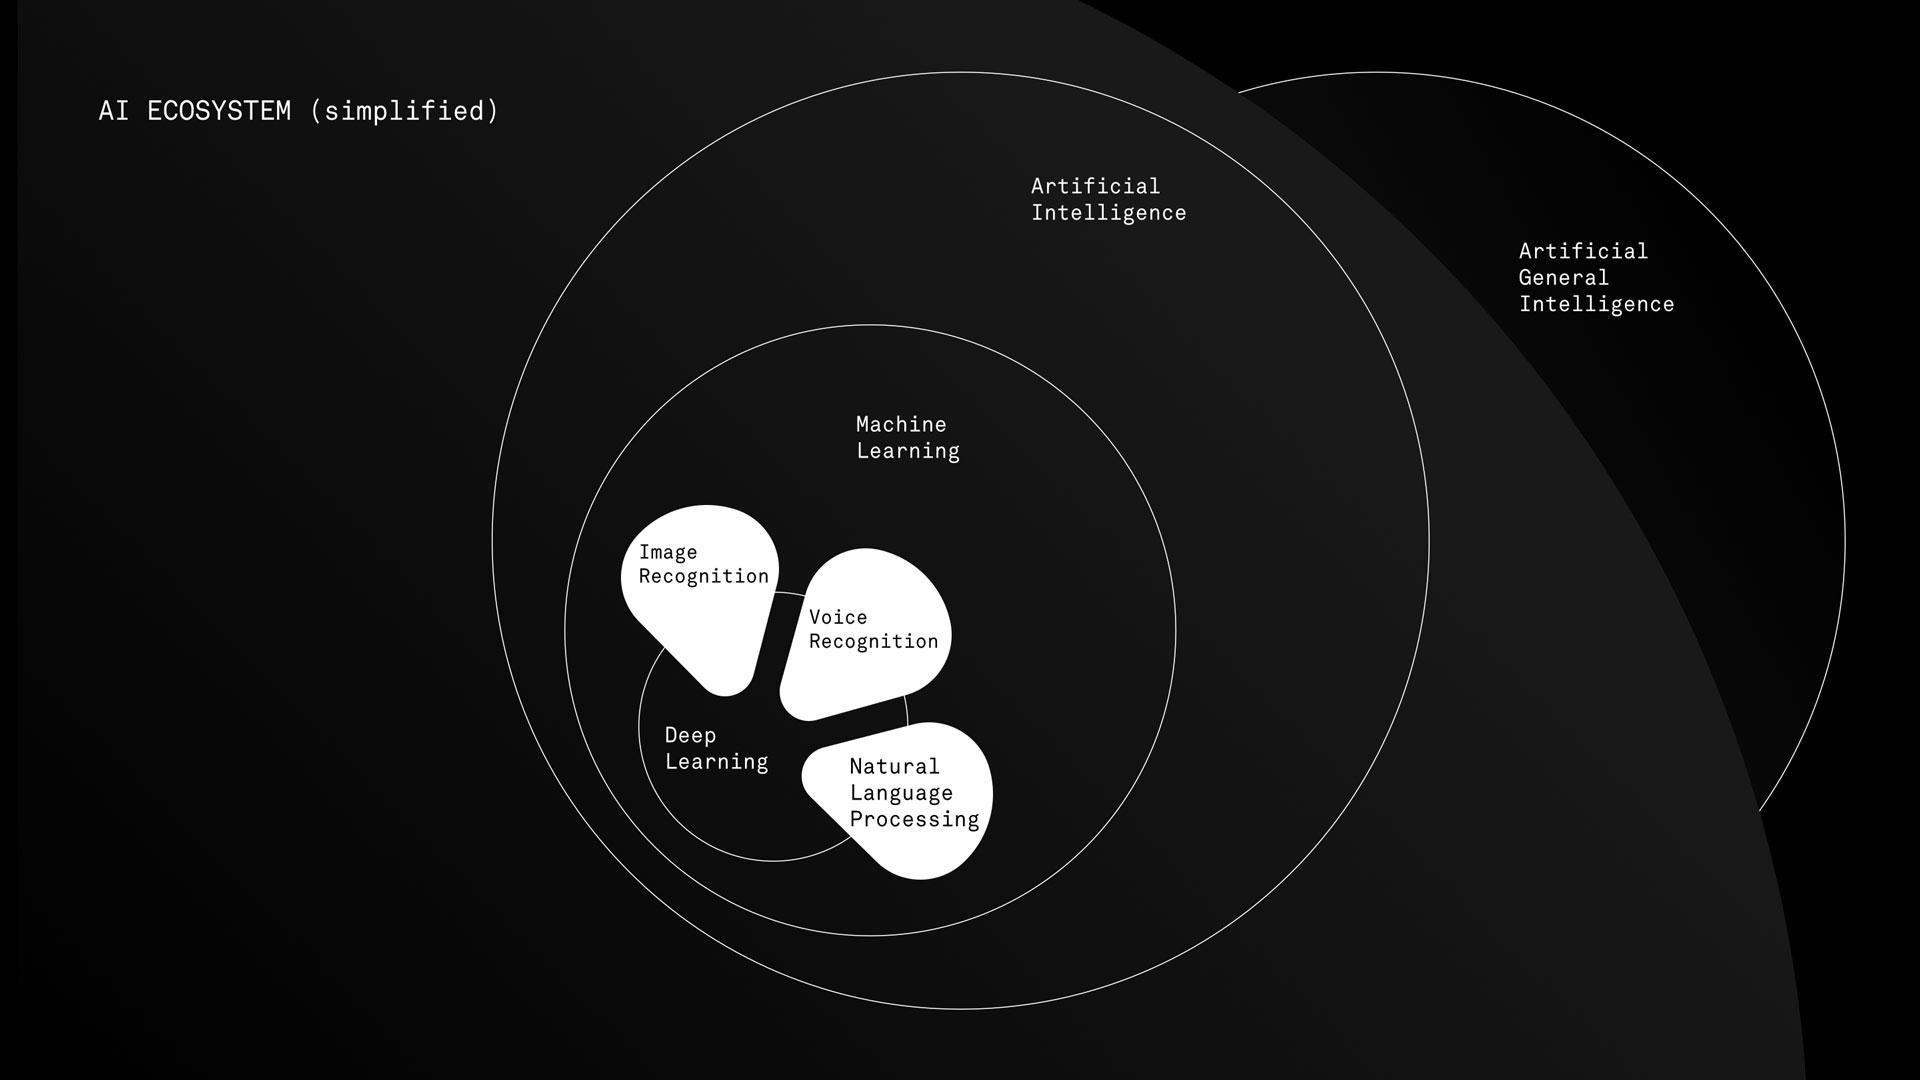 Crum_AI-ecosystem.jpg